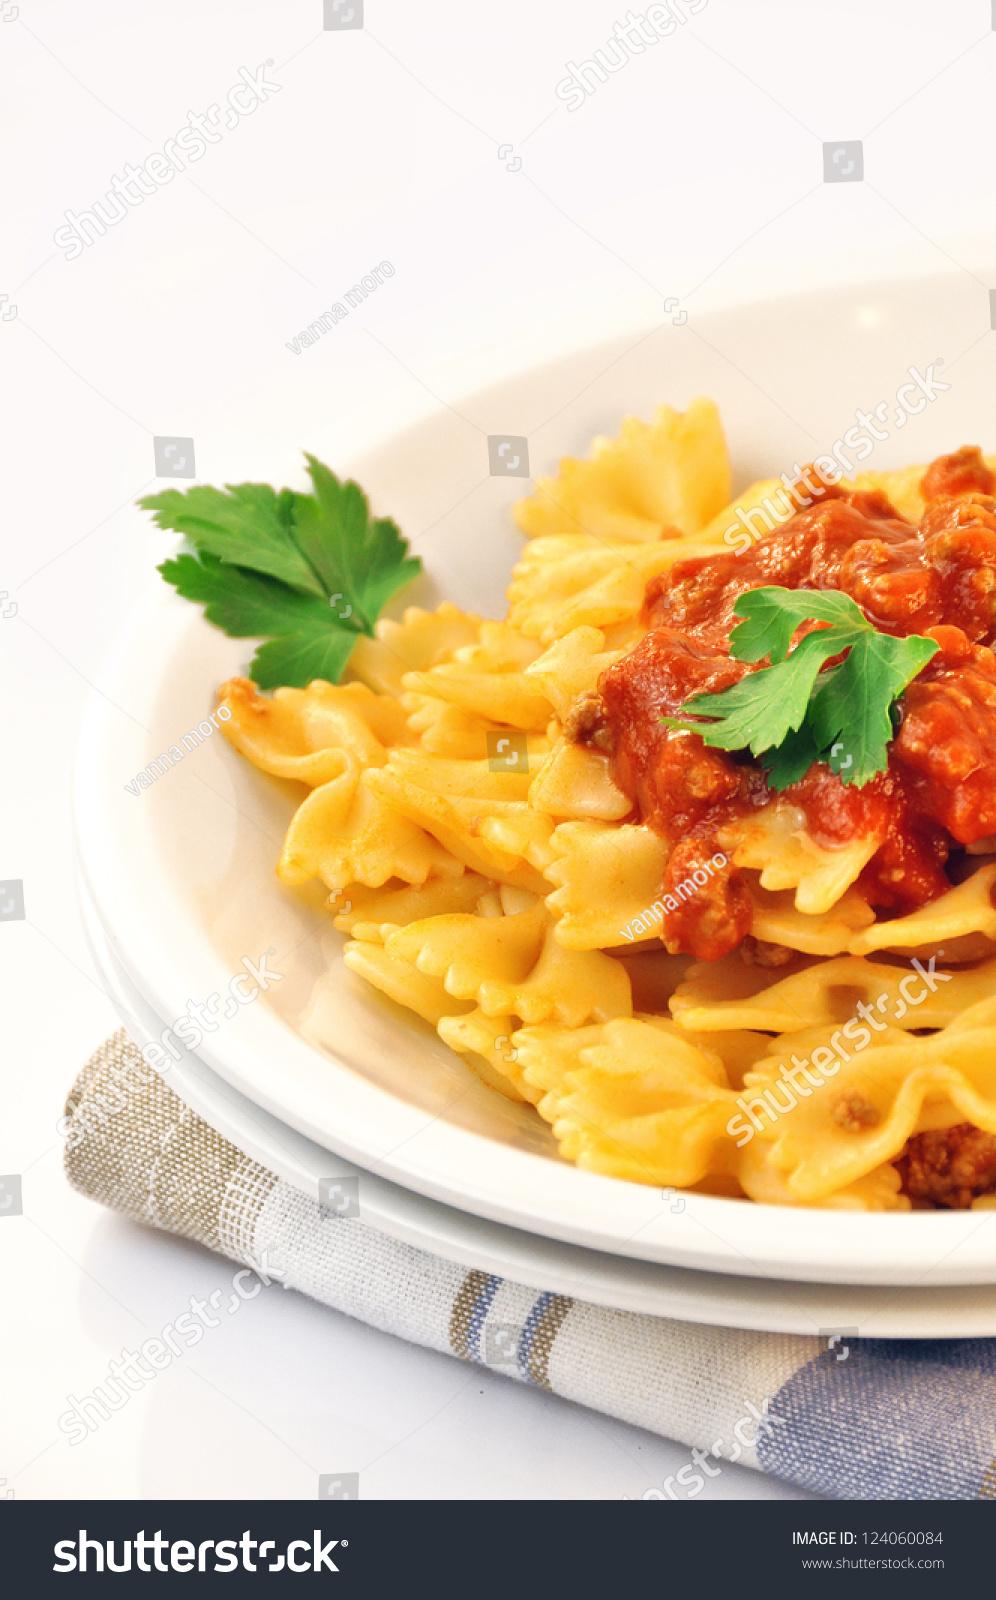 how to make italian tomato sauce for pasta